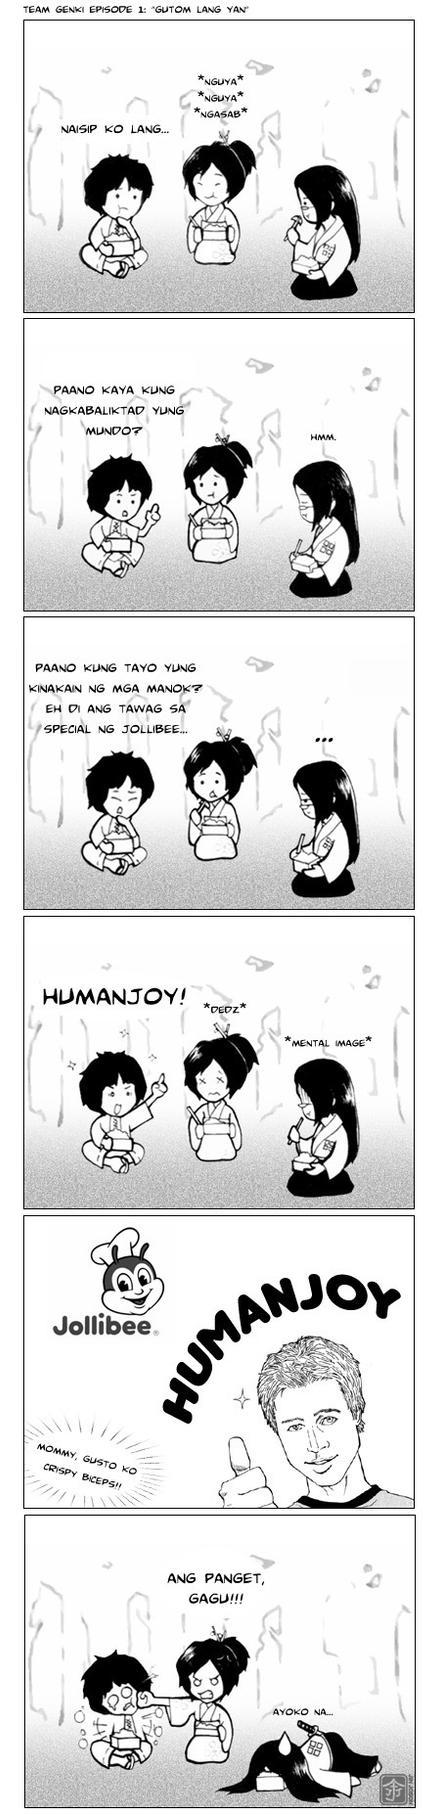 Gutom Lang Yan by behindinfinity